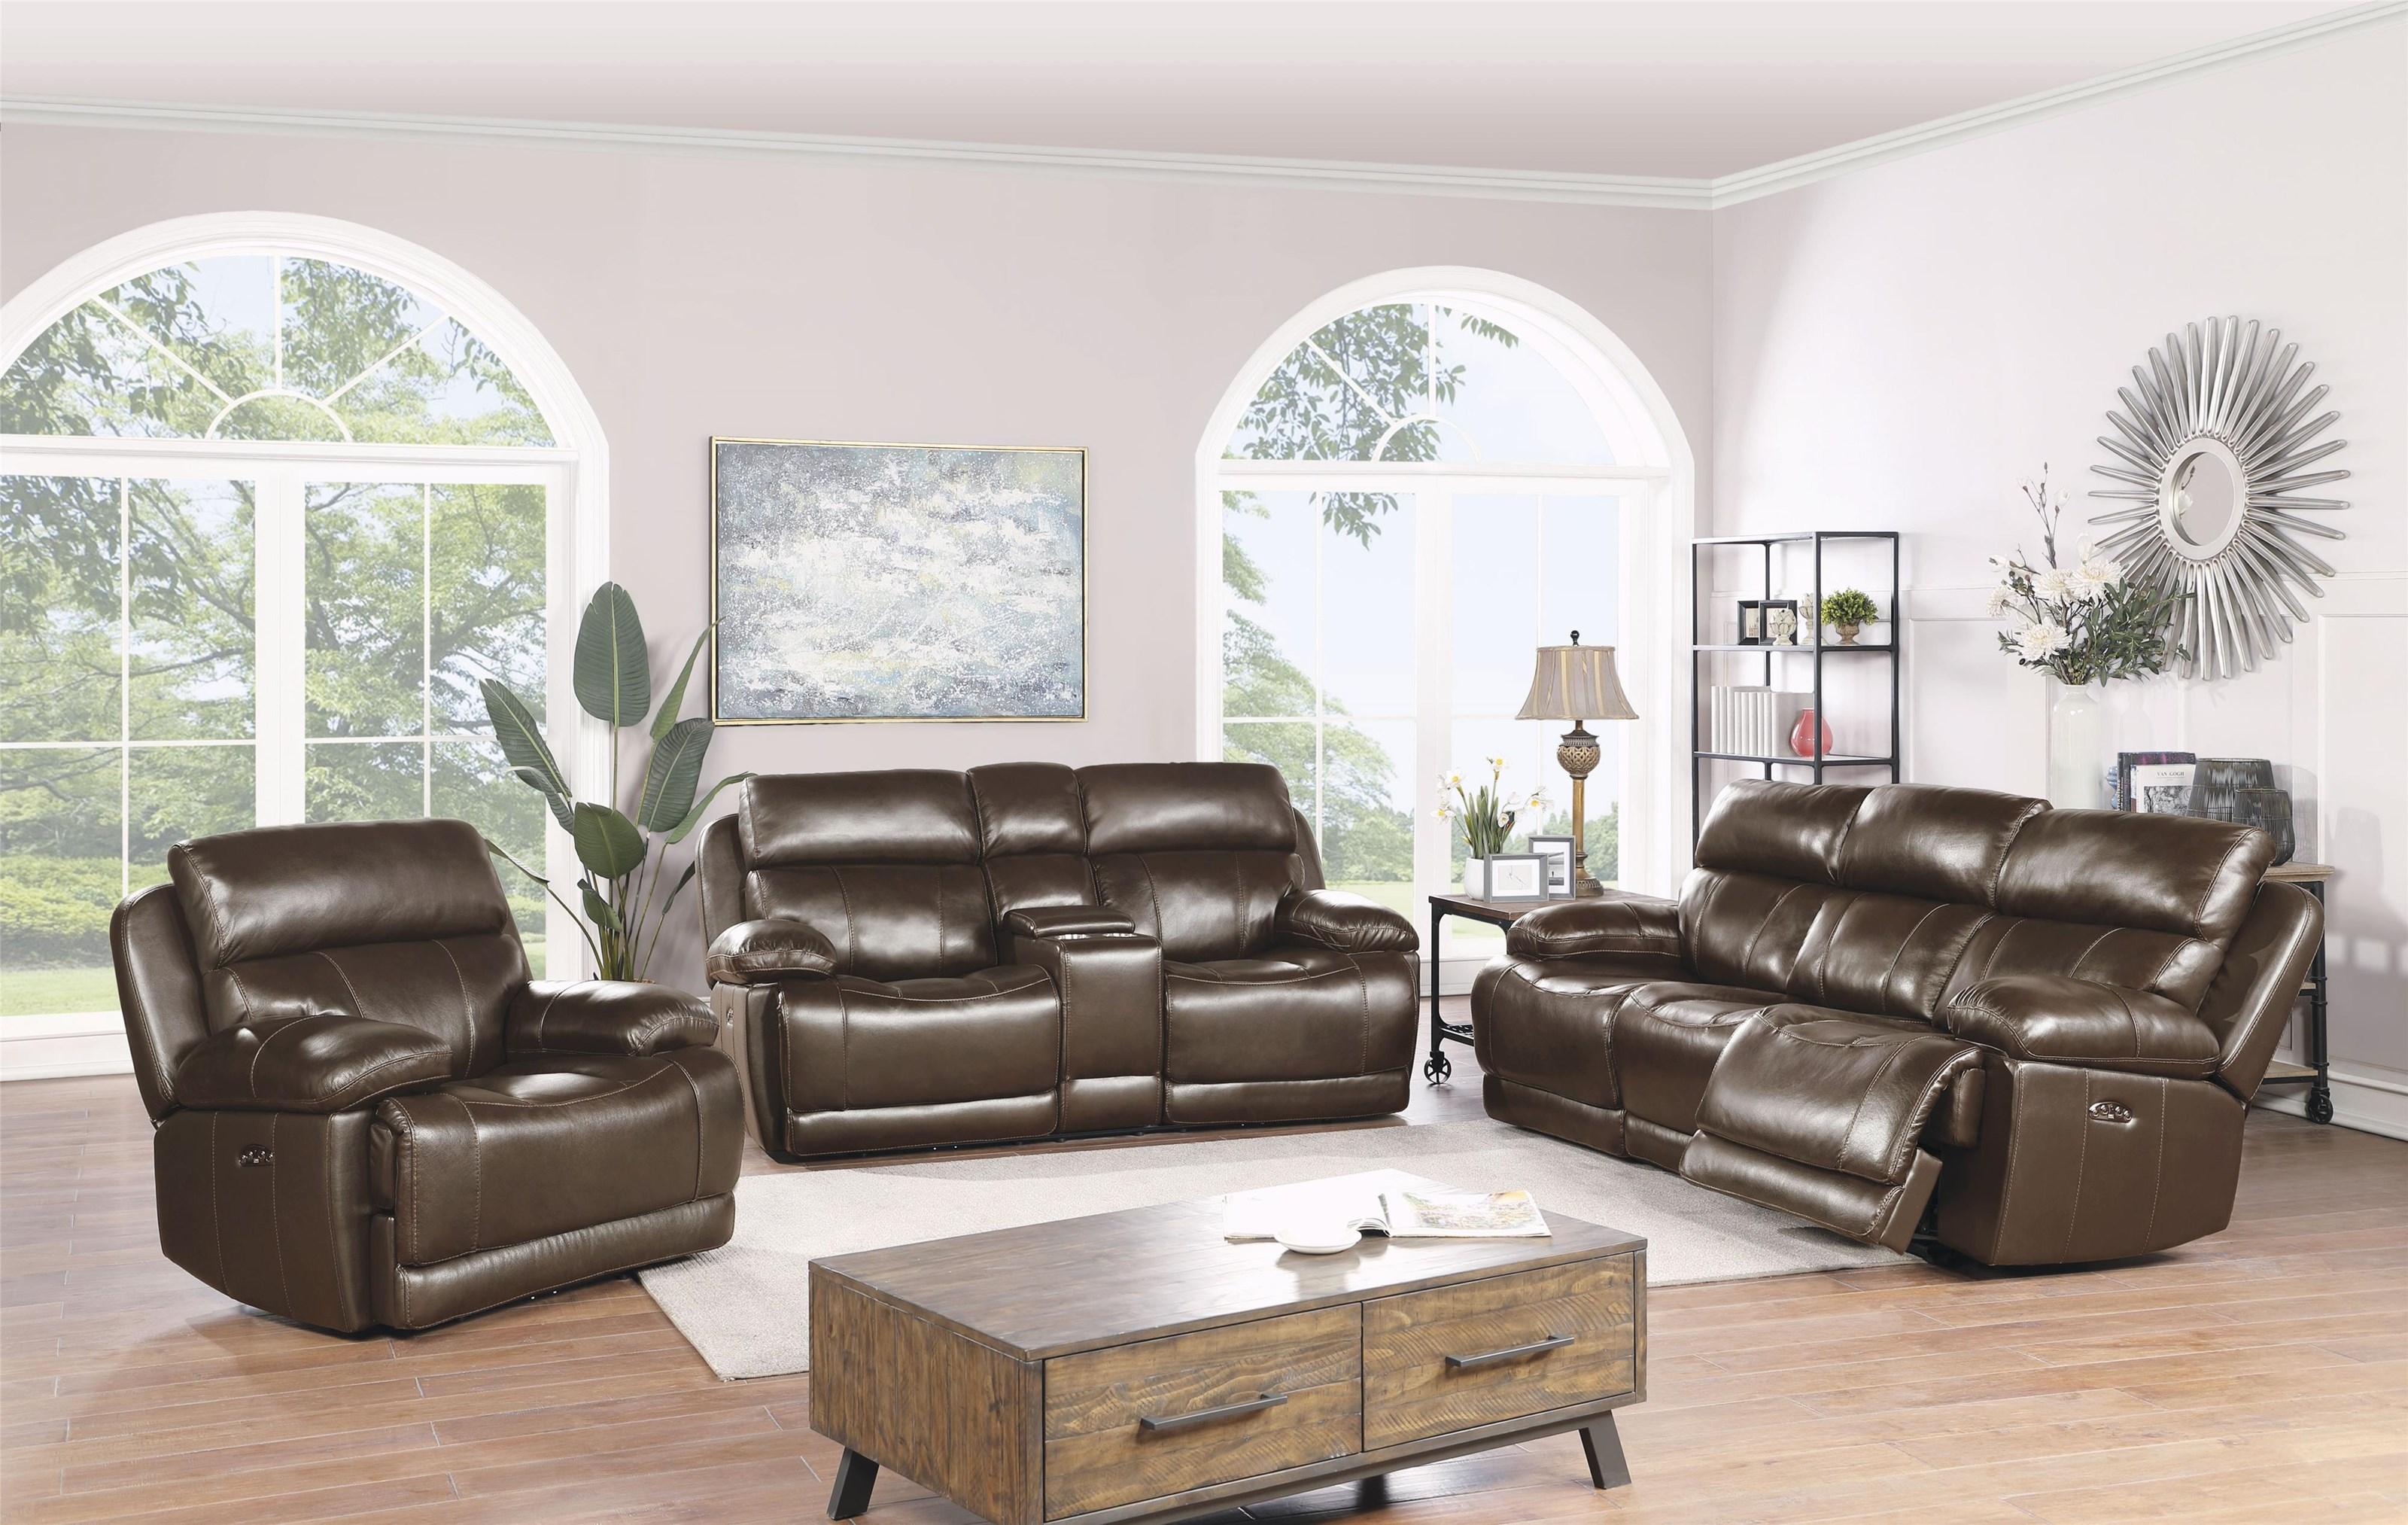 Trojan Power Headrest Sofa, Loveseat and Recliner by H317 Logistics at Sam Levitz Furniture